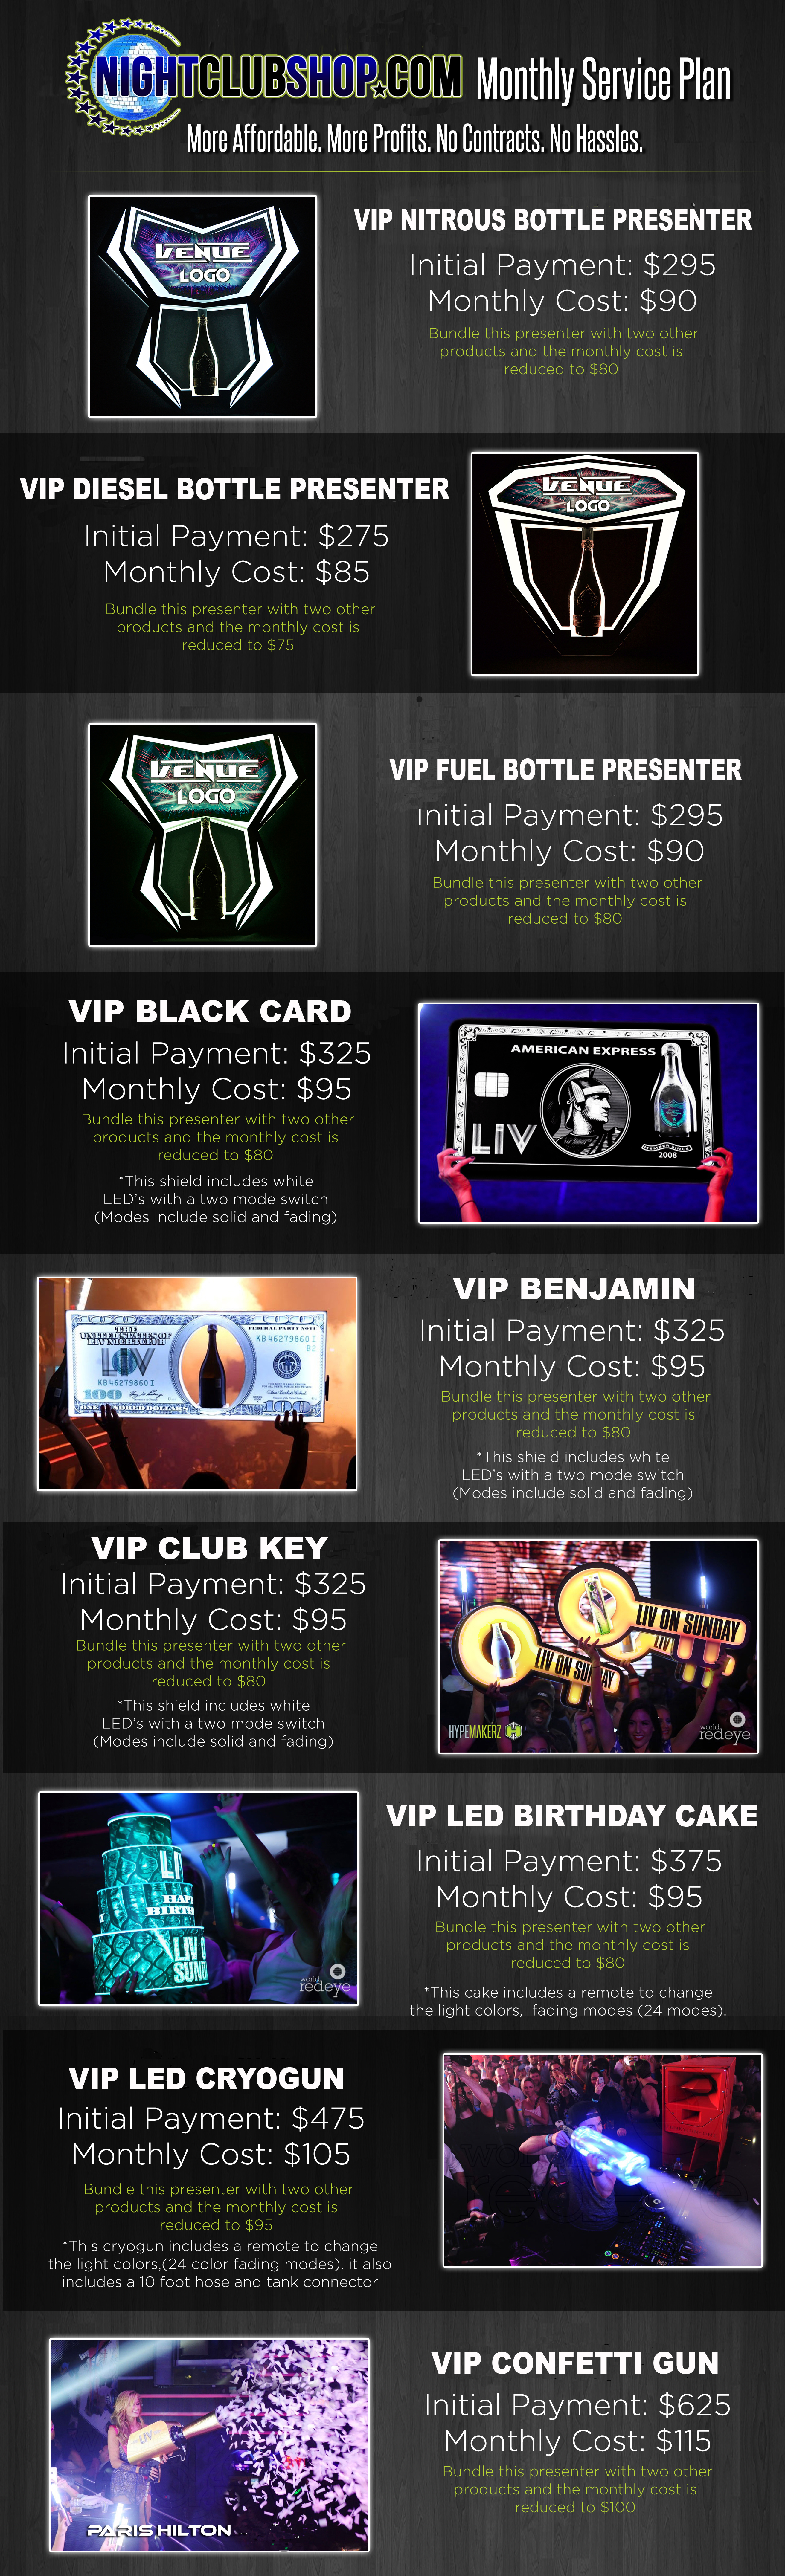 2.nightclubshop-monthly-service-plan.jpg